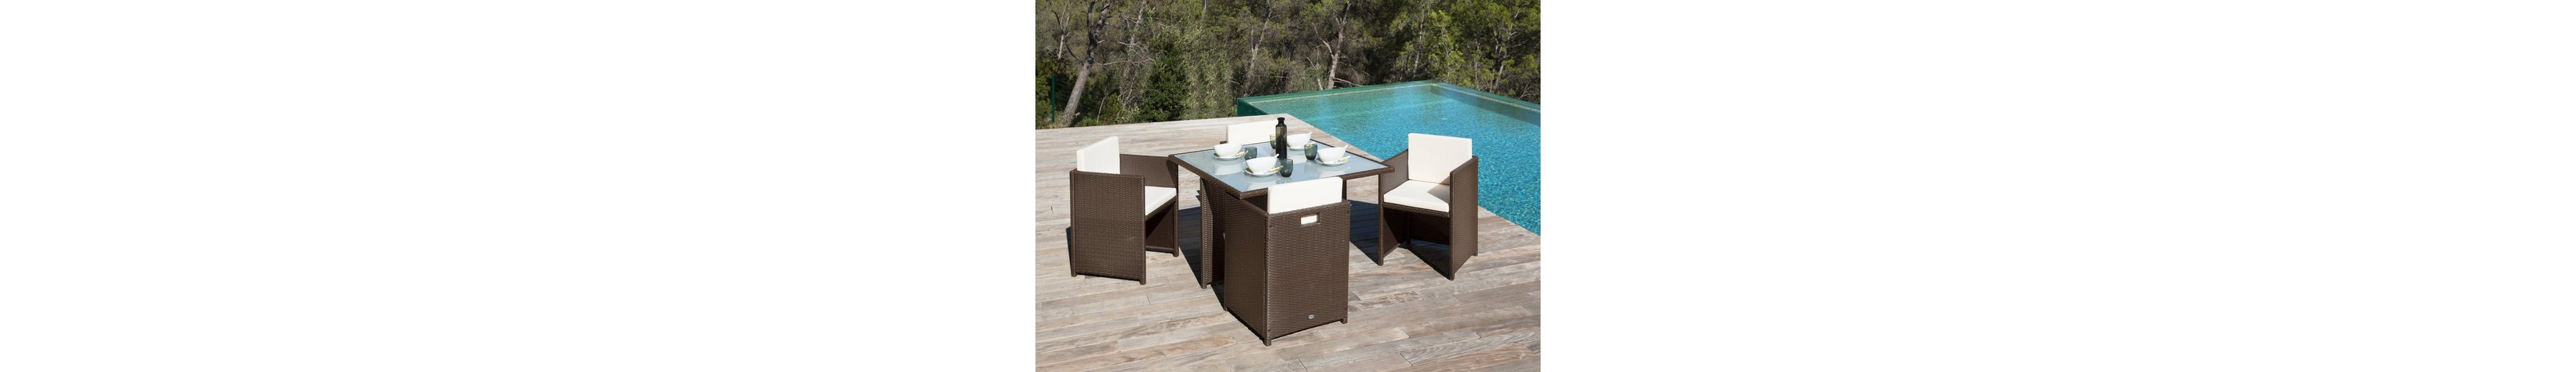 13-tgl. Gartenmöbelset »Verona«, 4 Sessel, Tisch 110x110 cm, Kunststoff, braun